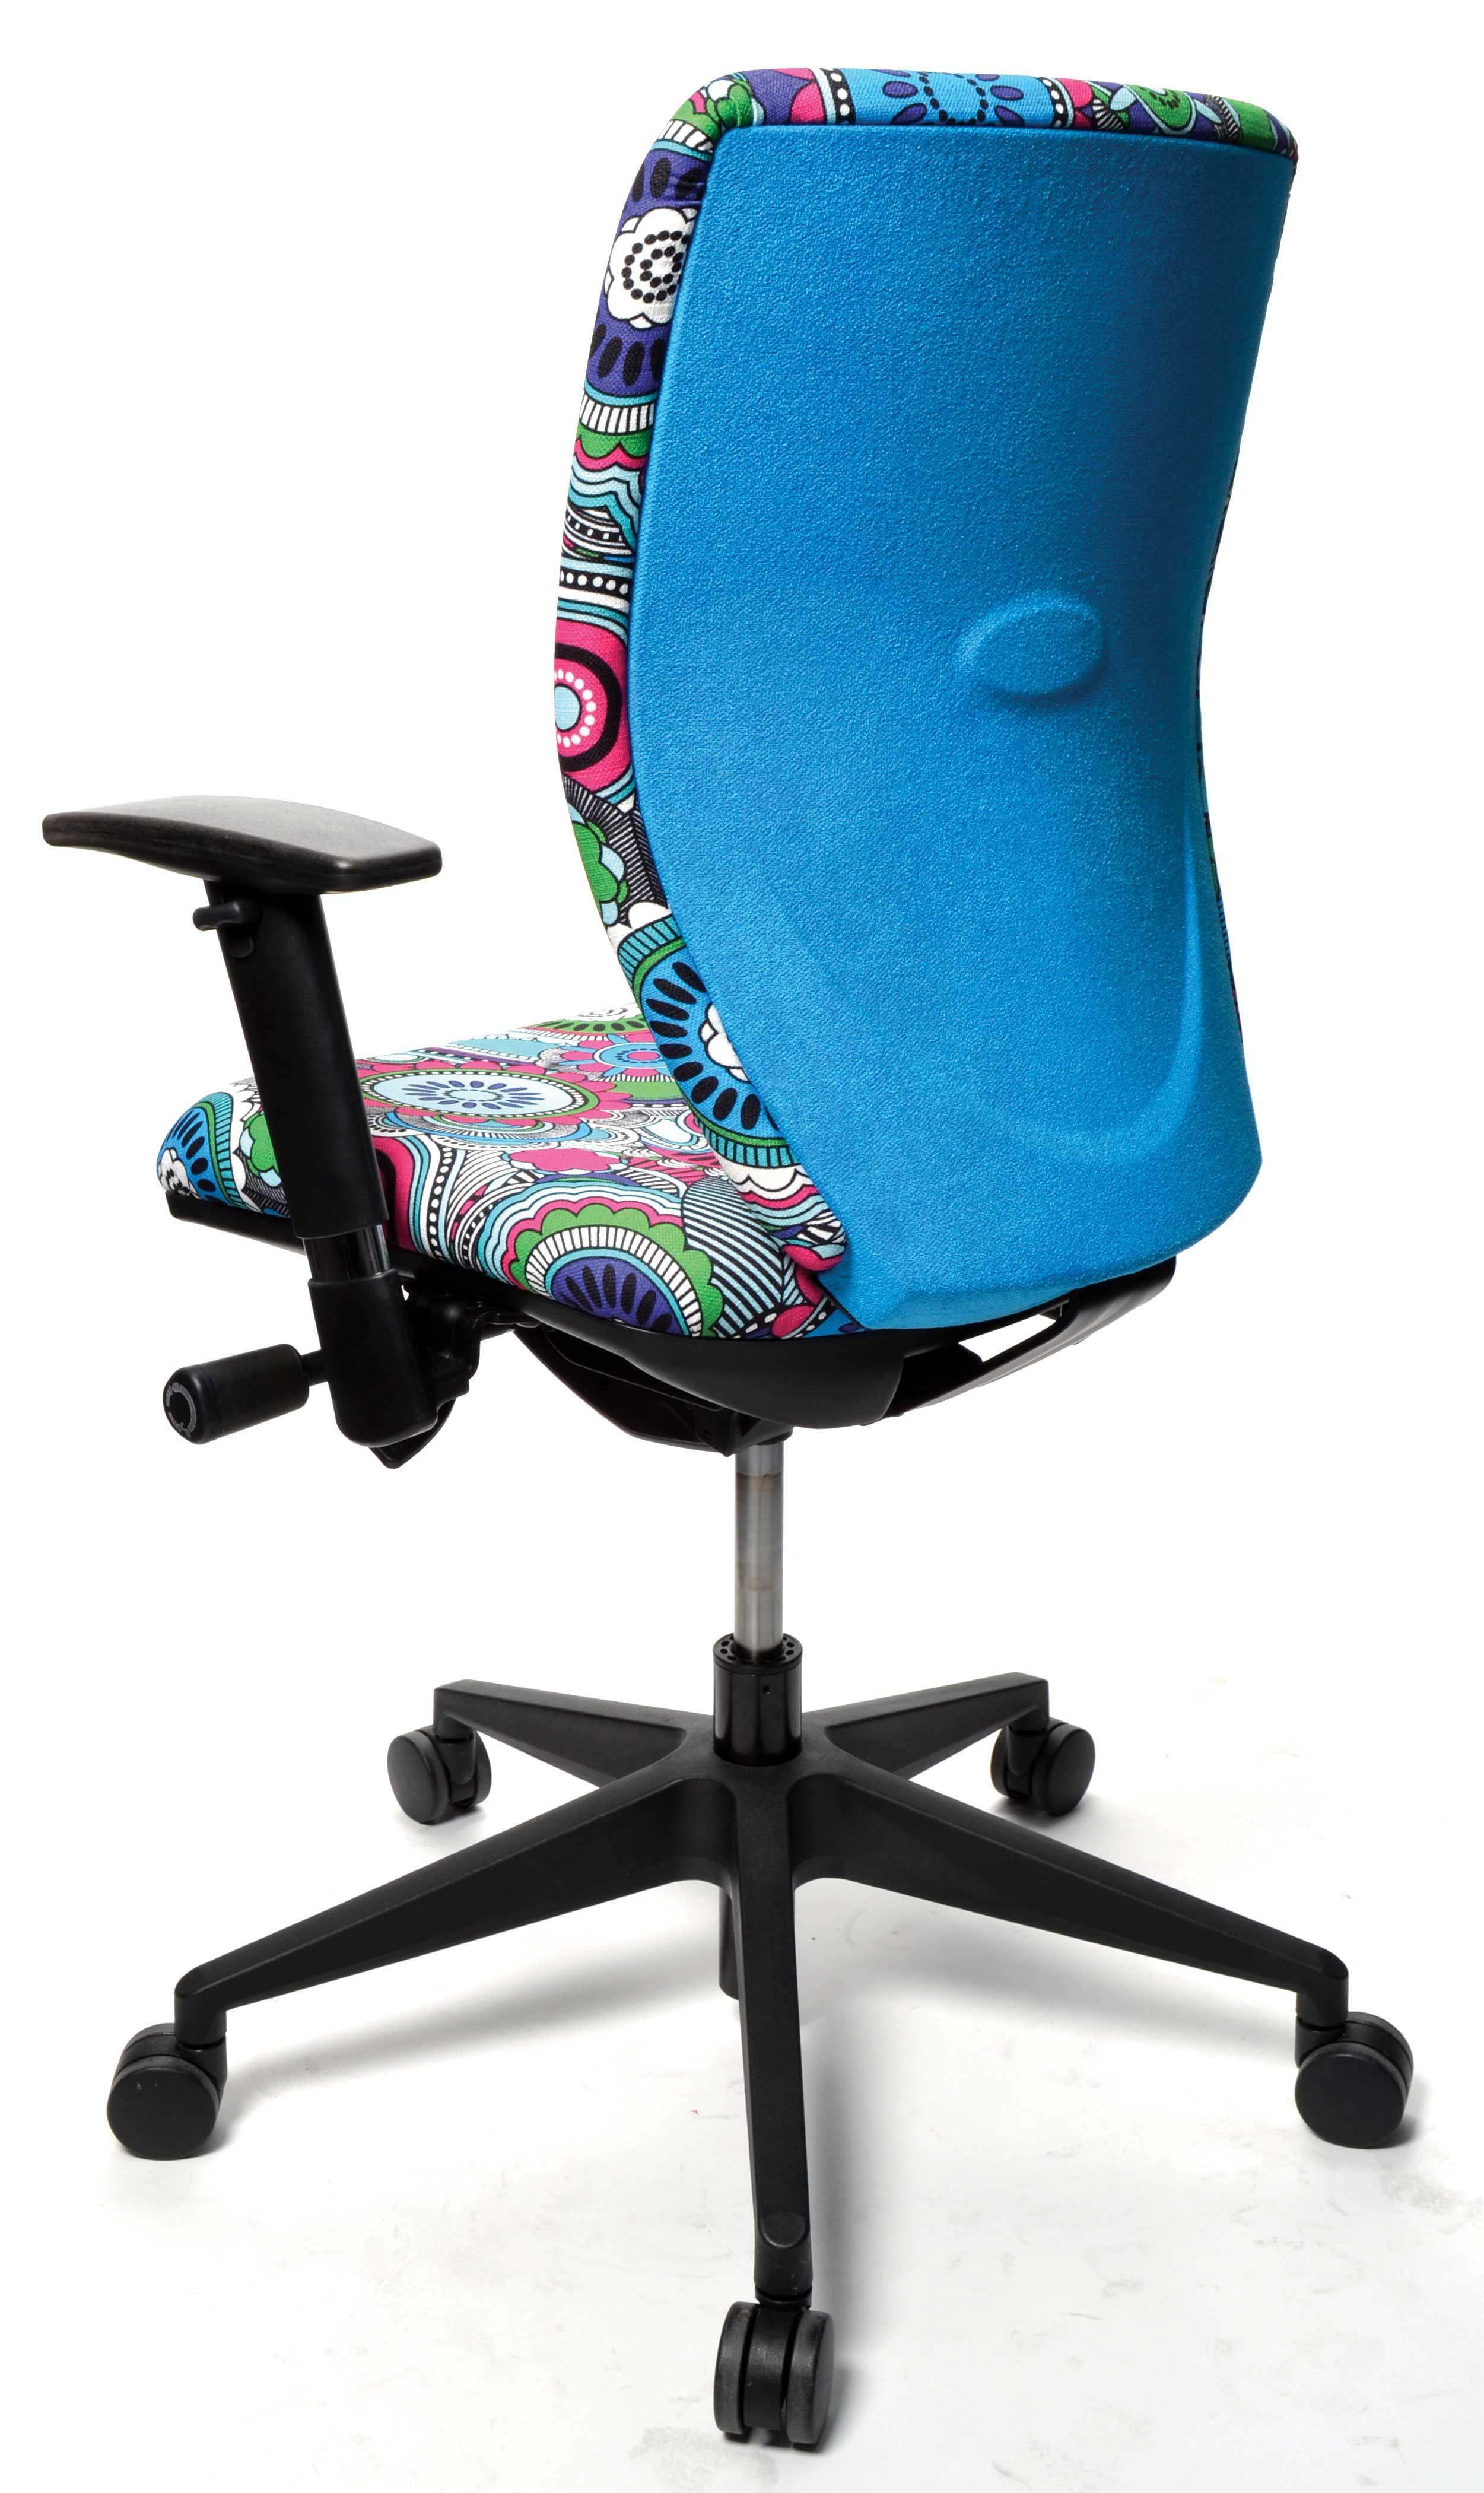 Holiday Isle And Ashcroft Fabrics On Fuze Interiors U0027Extremeu0027 Chair.